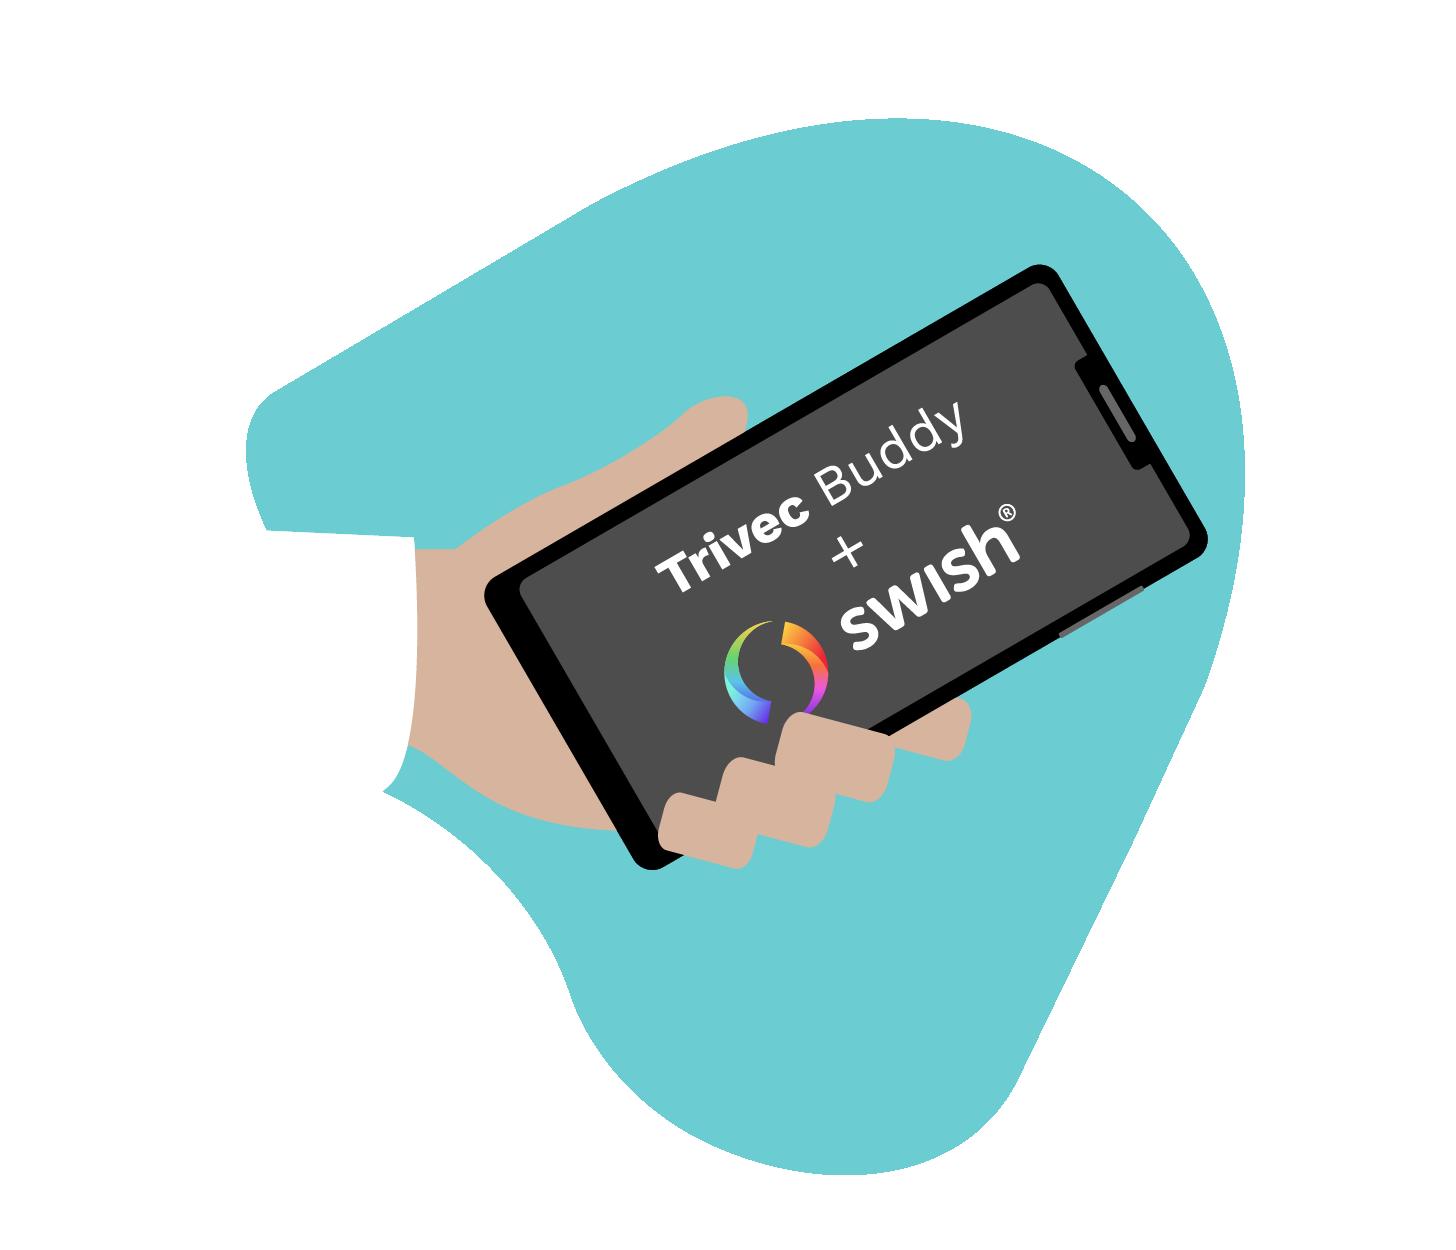 Trivec Buddy supports Swish